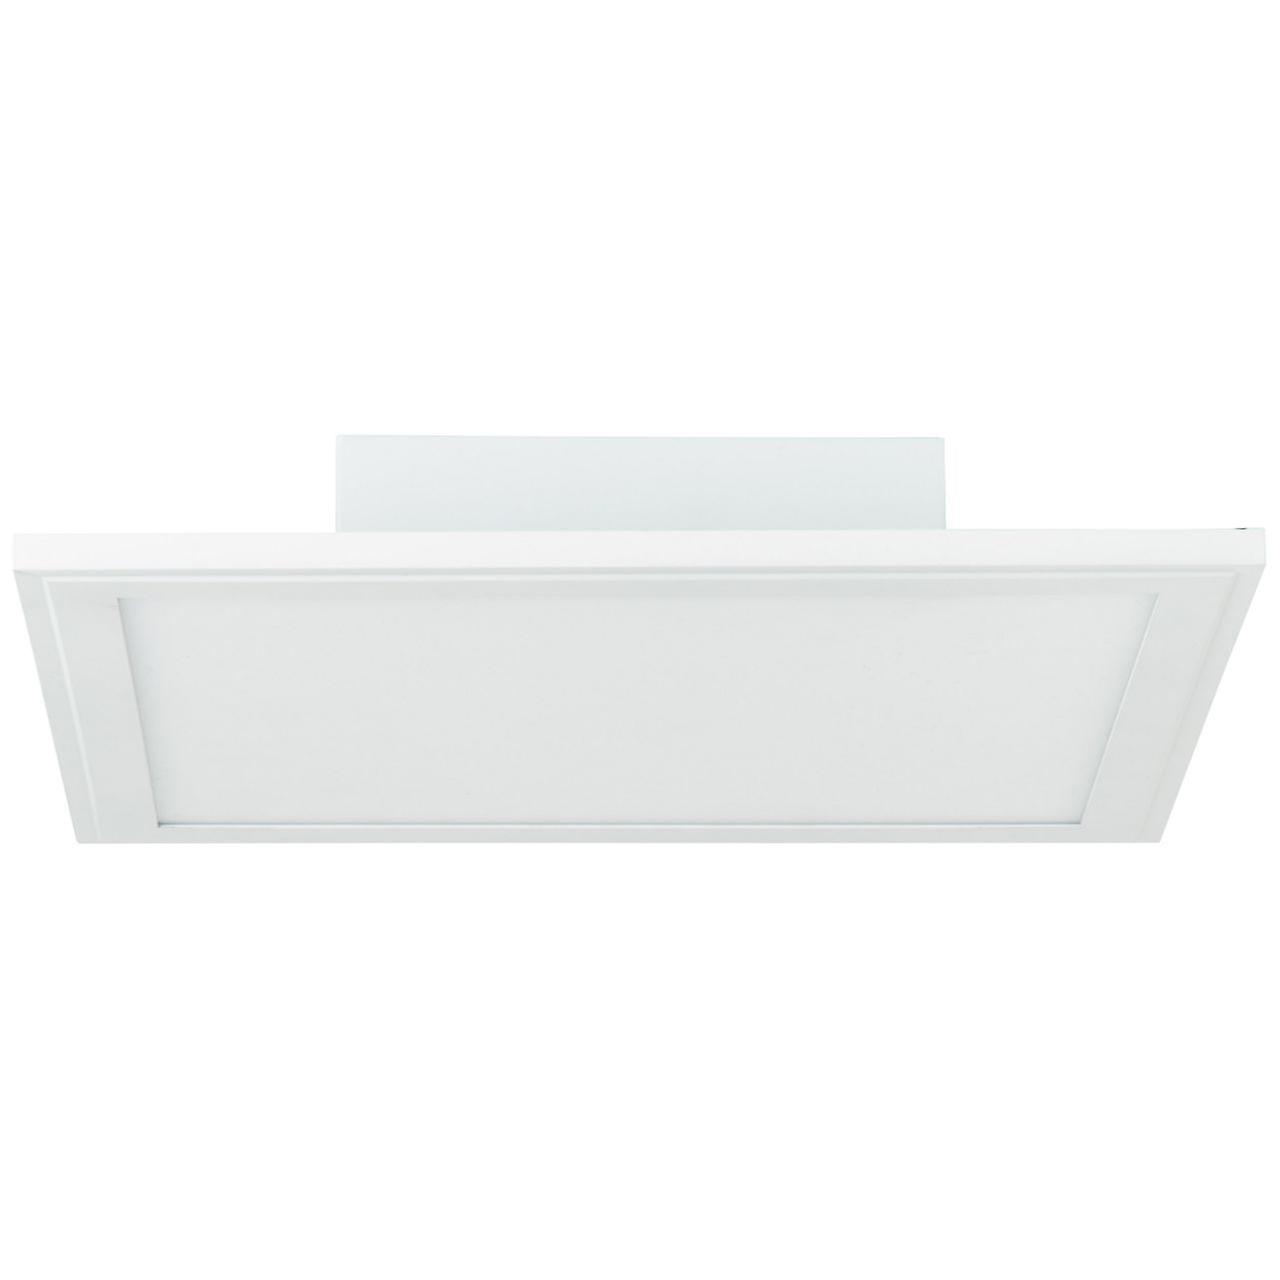 BRILLIANT Lampe Abie LED Deckenaufbau-Paneel 30x30cm RGB weiß | 1x 18W LED integriert, (1800lm, 2700-6200K) | Skala A++ bis E | Mit Fernbedienung steuerbar